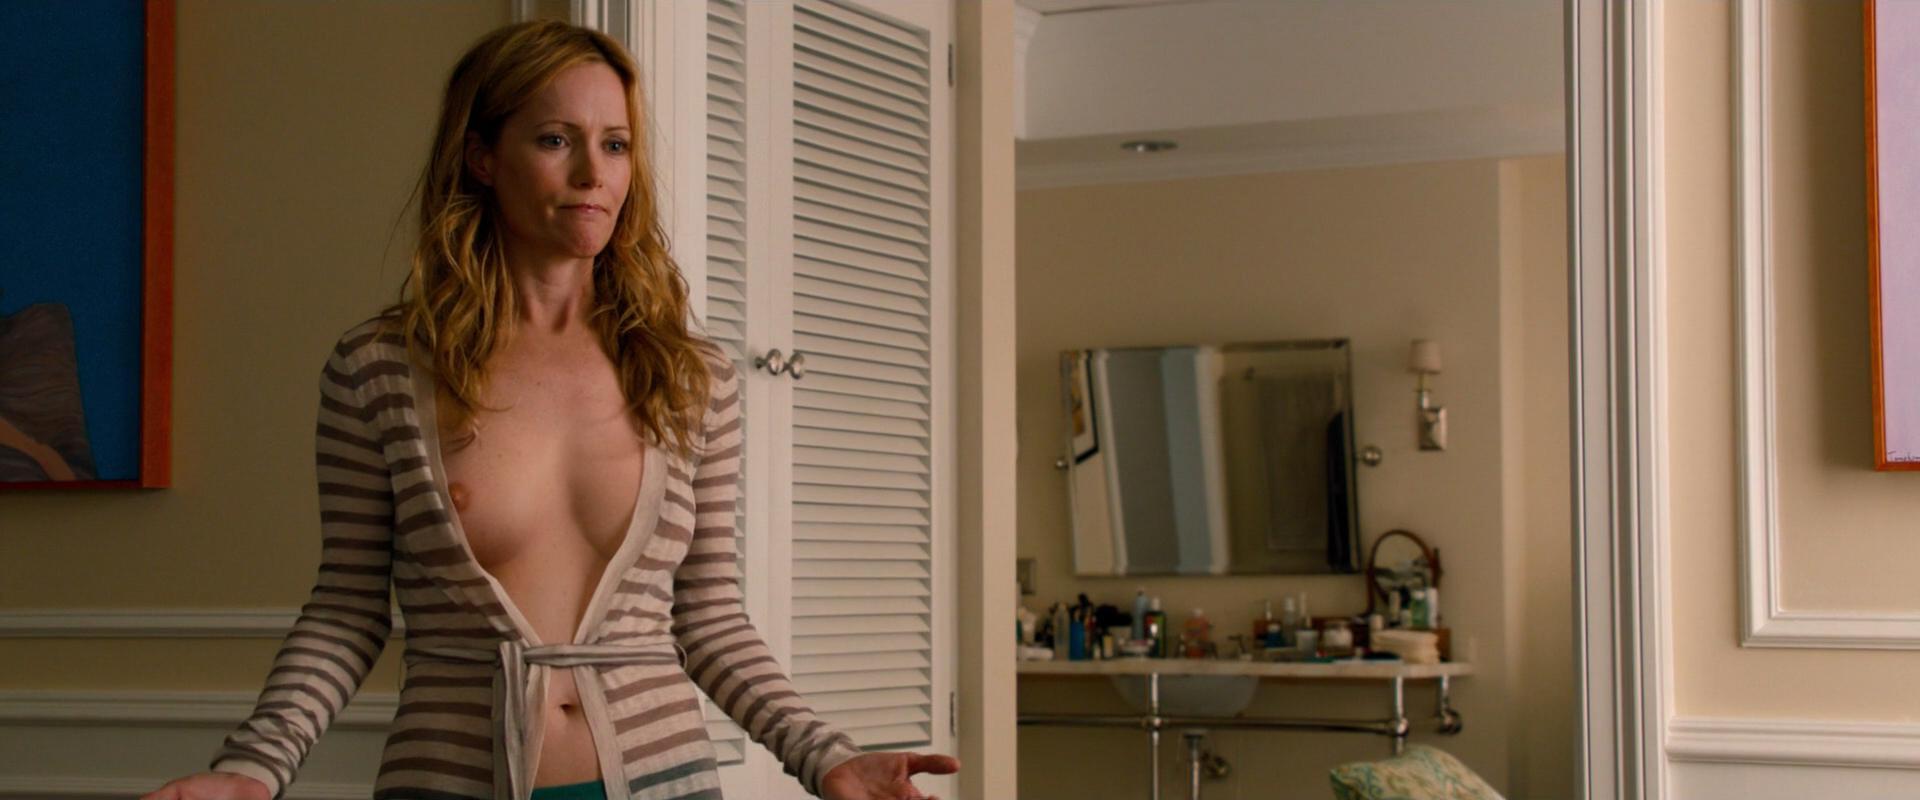 Herrera lorena nude pic